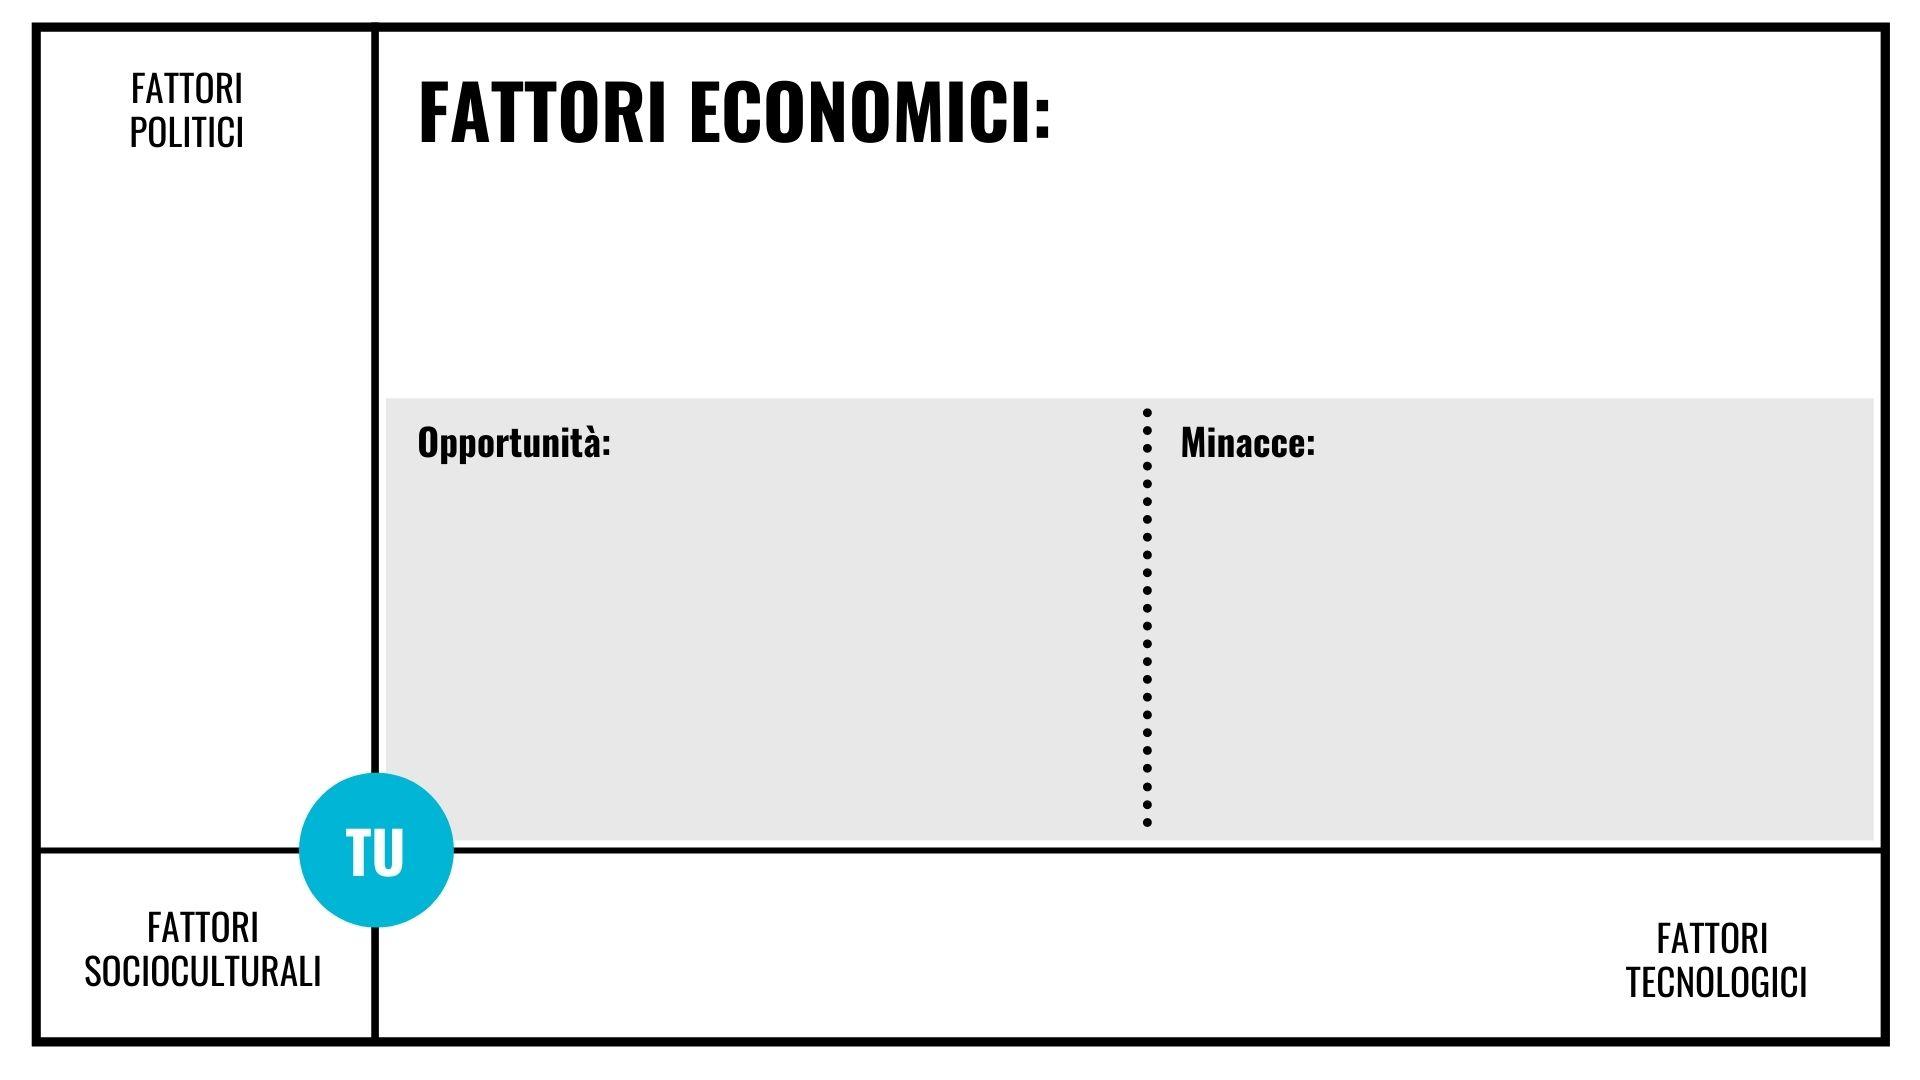 Matrice analisi PEST Fattori economici